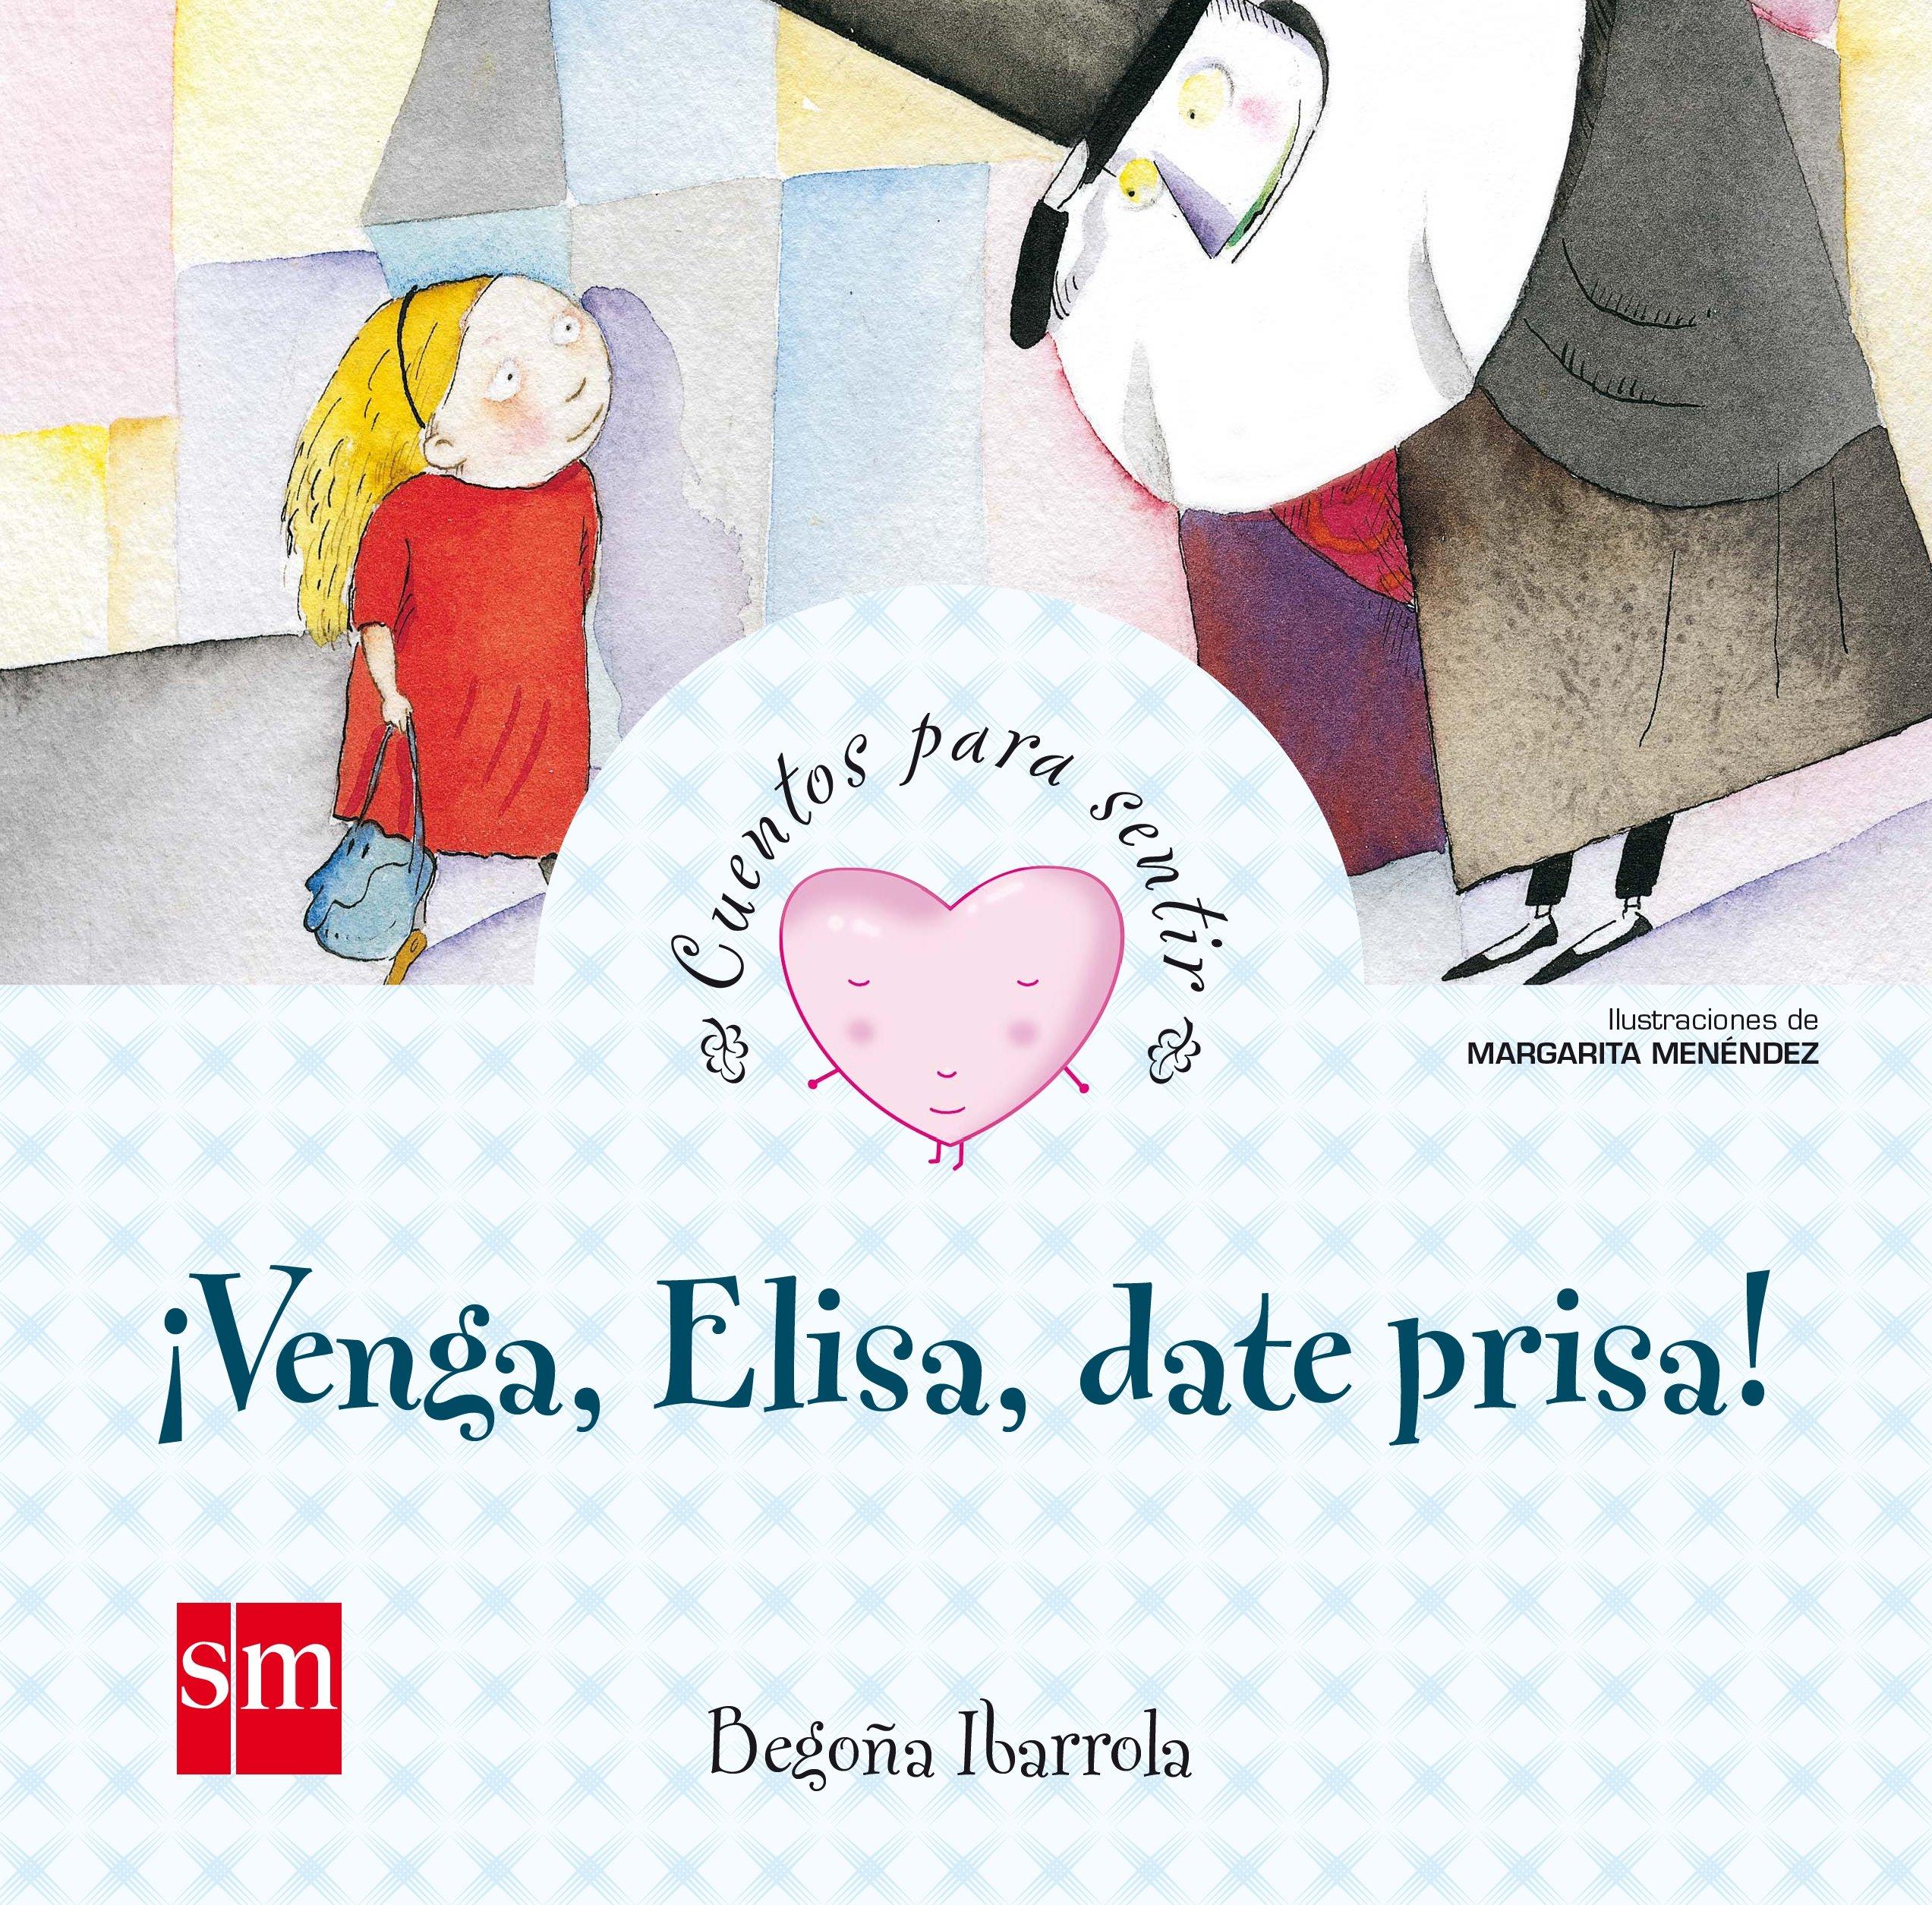 Venga, Elisa, date prisa (Cuentos para sentir): Amazon.es: Begoña Ibarrola,  Margarita Menéndez Gutiérrez: Libros